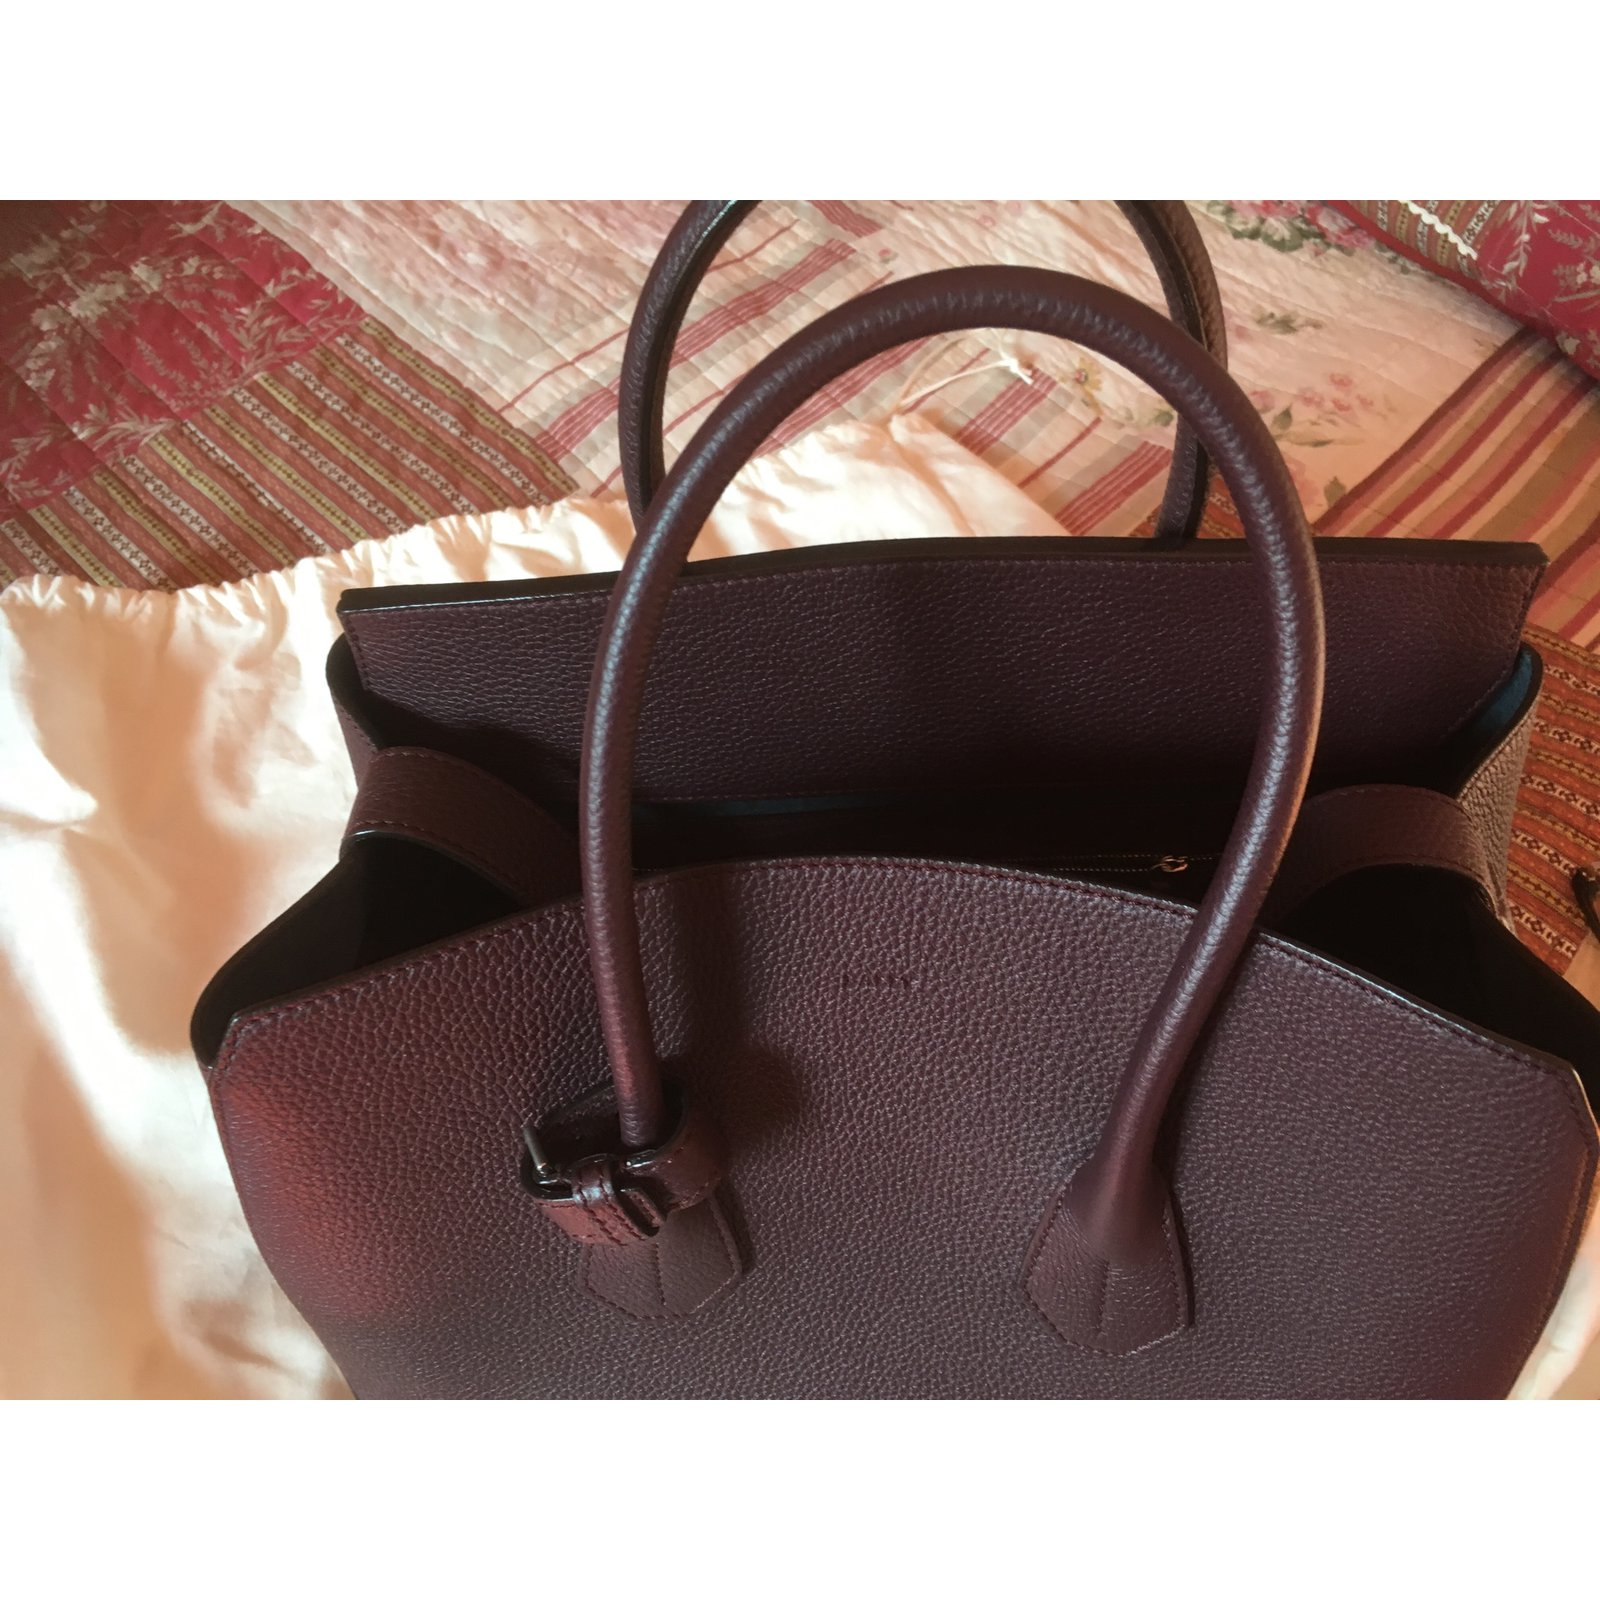 2decaac6b2 Bally Bally bag Medium model top Handbags Leather Dark red ref.103641 -  Joli Closet